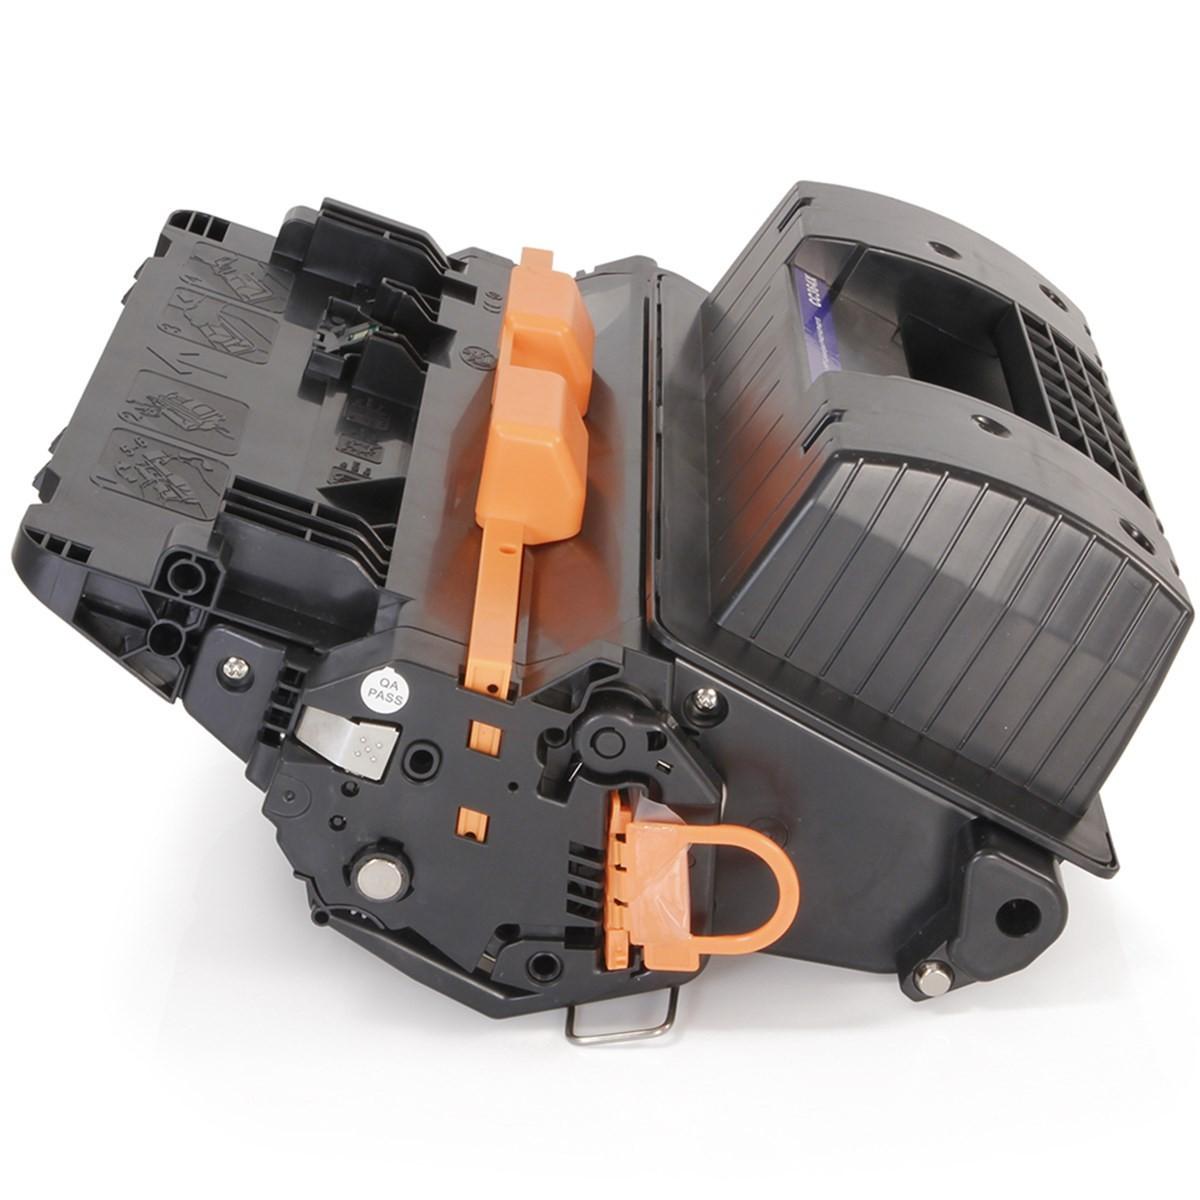 Toner Compatível com HP CC364X | P4015 P4015N P4015DN P4015TN P4515 P4515N P4515XM